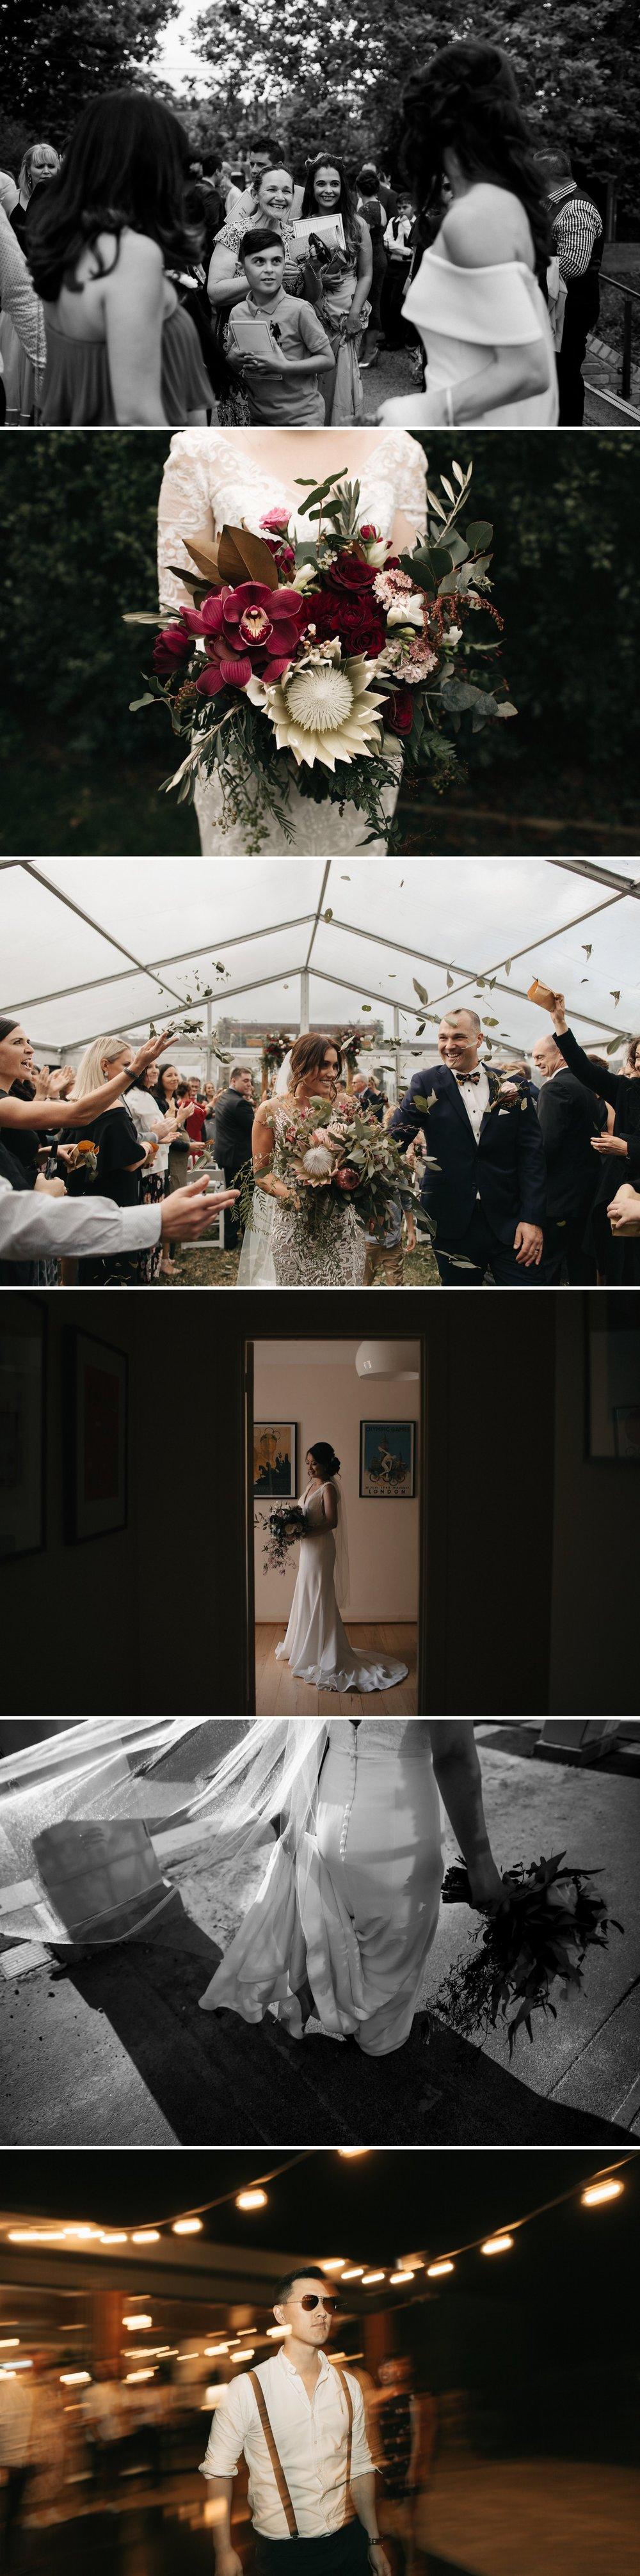 relaxed-wedding-photographer-melbourne_0016.jpg